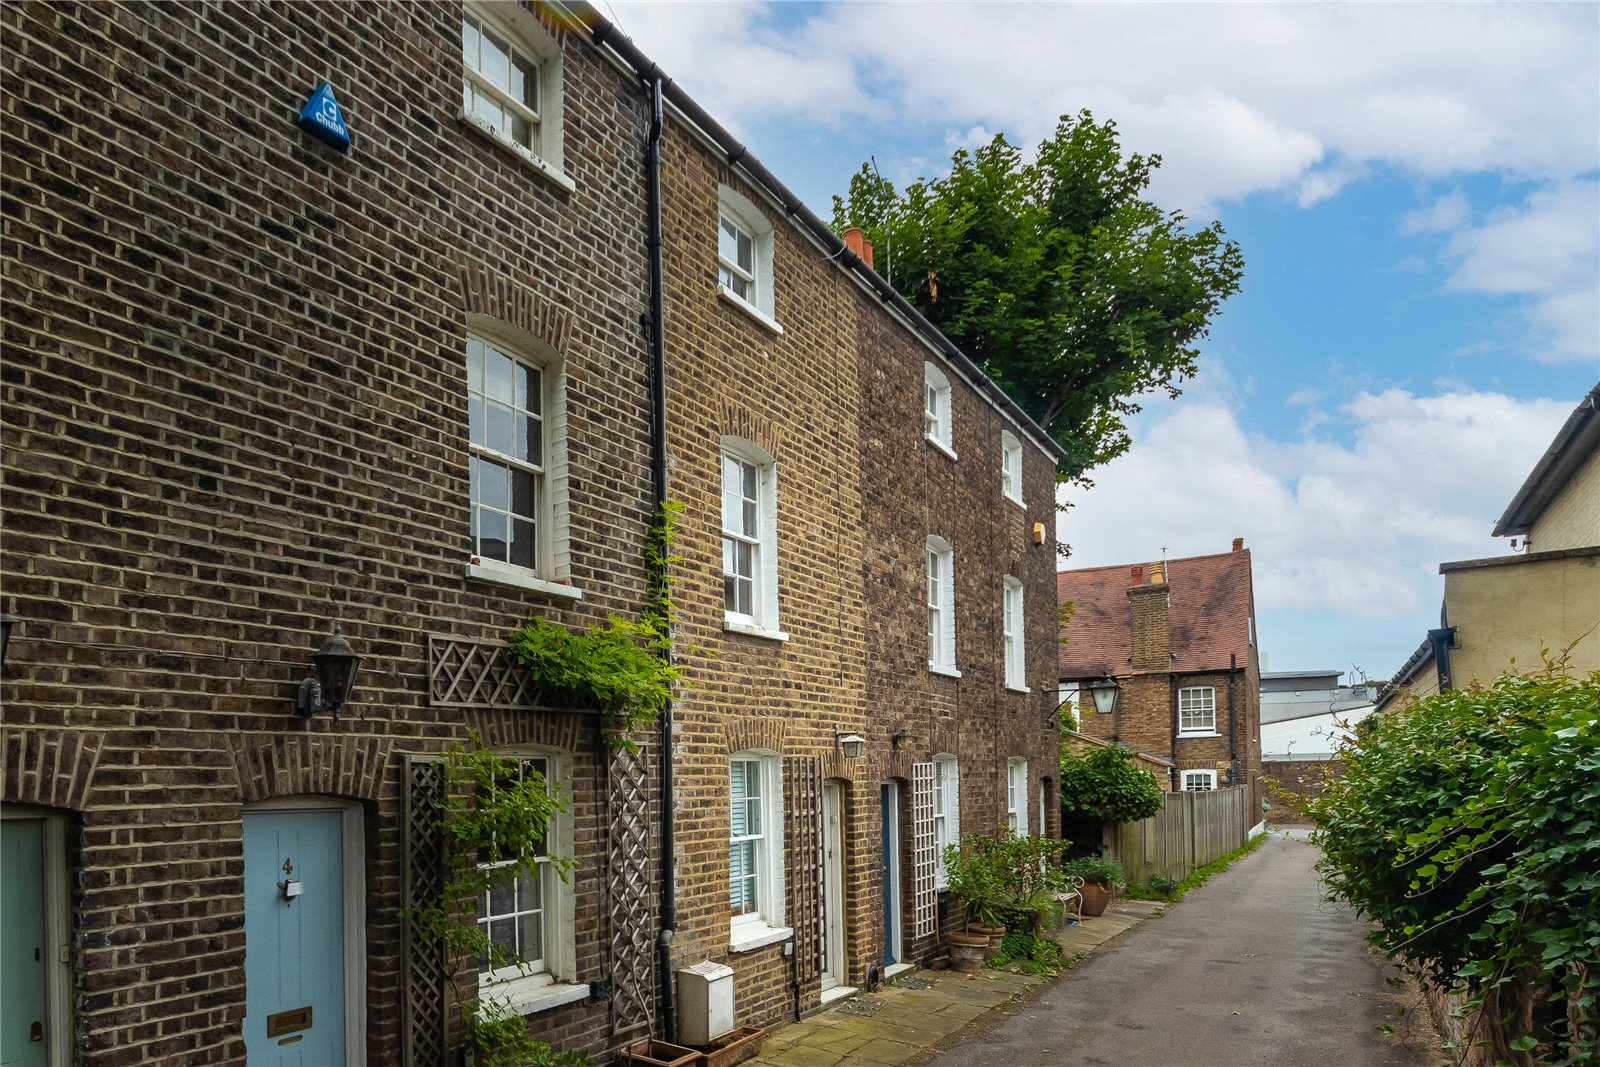 James's Cottages, Kew Road, TW9 3DX - Antony Roberts